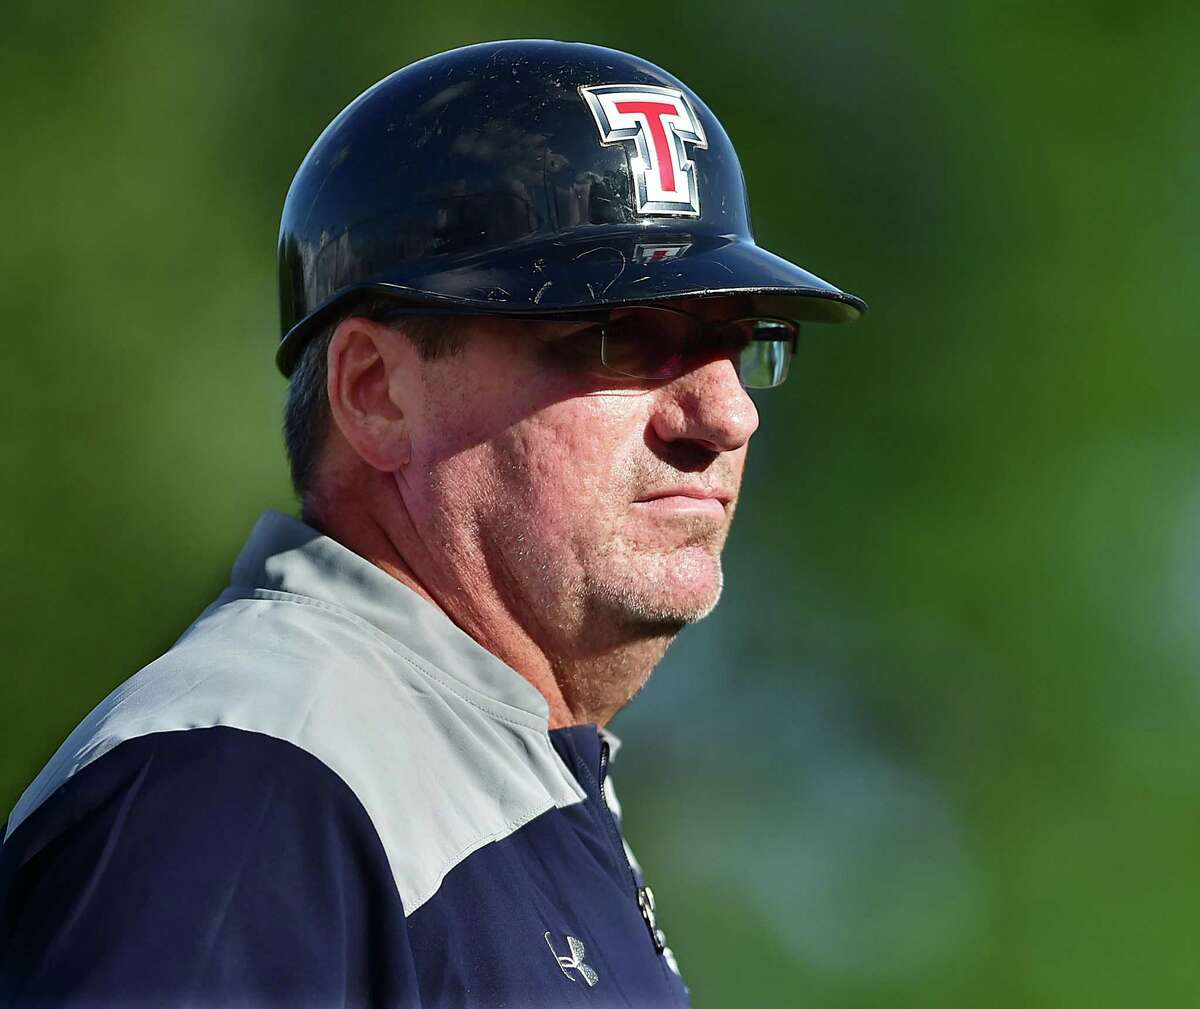 Trumbull head coach Jack McFarland against Hamden, Tuesday, July 24, 2018, in the American Legion senior state tournament at Hamden High School. Trumbull won, 13-0.